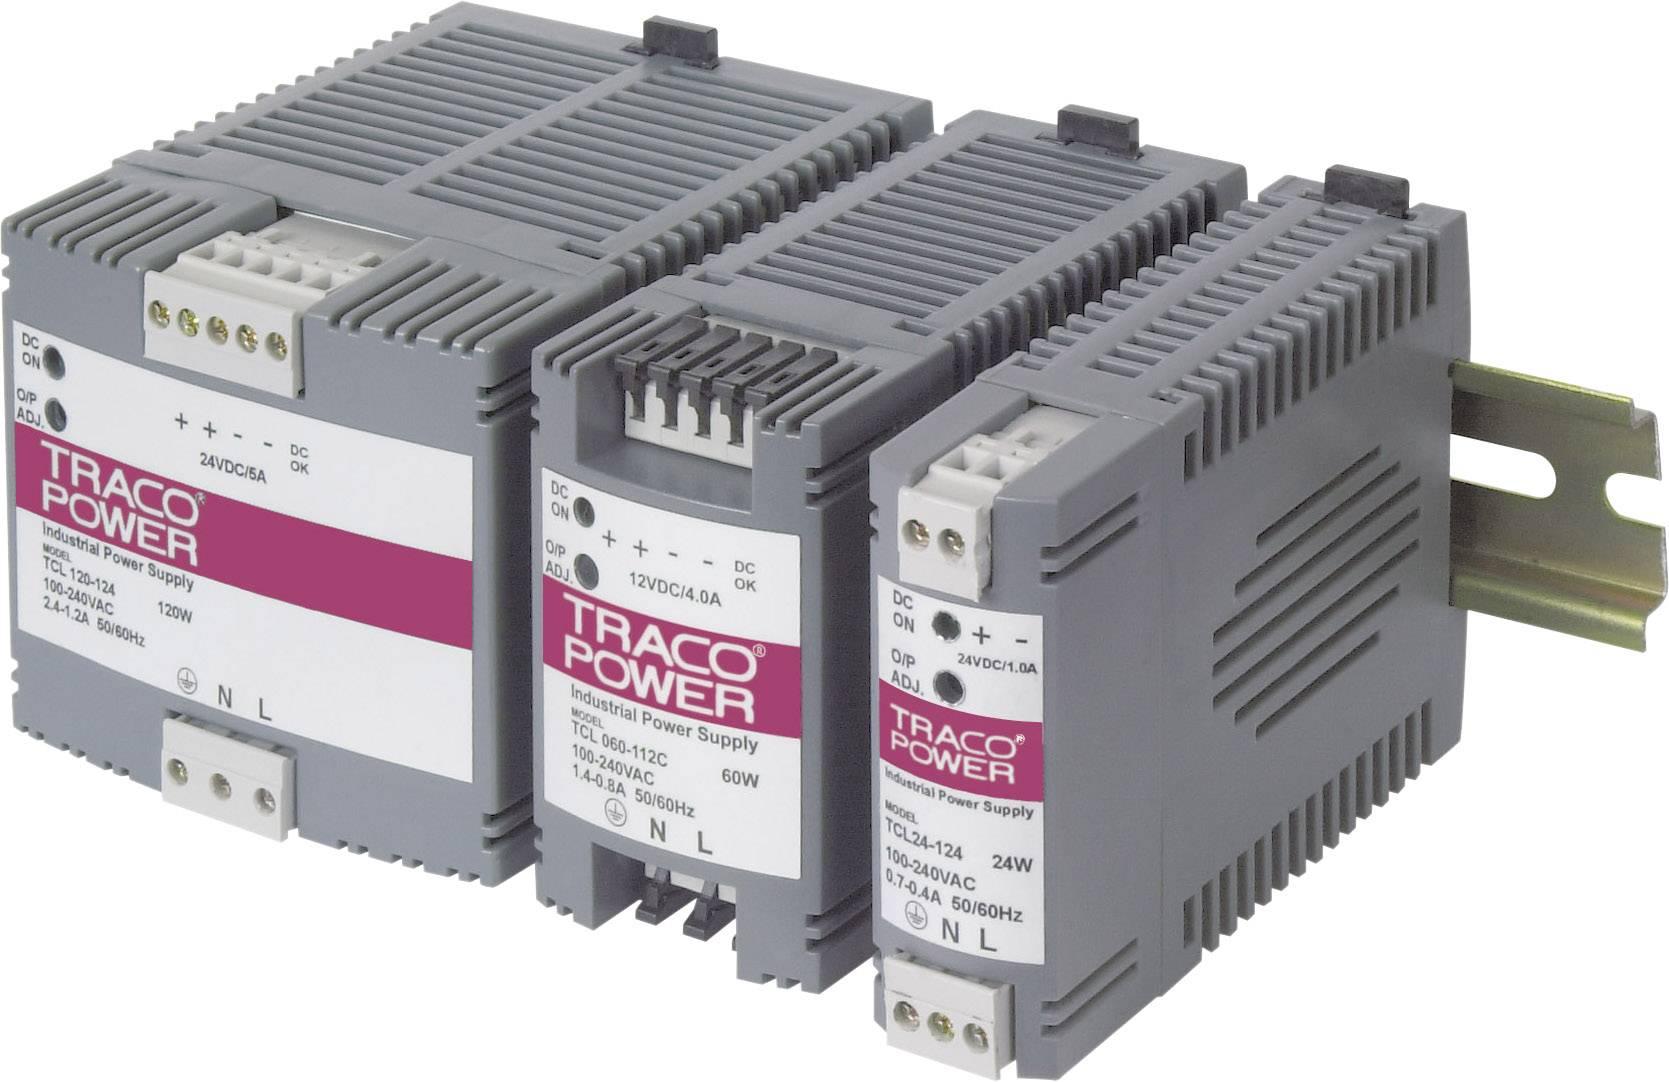 Zdroj na DIN lištu TracoPower TCL 120-112C, 12 V/DC, 8 A